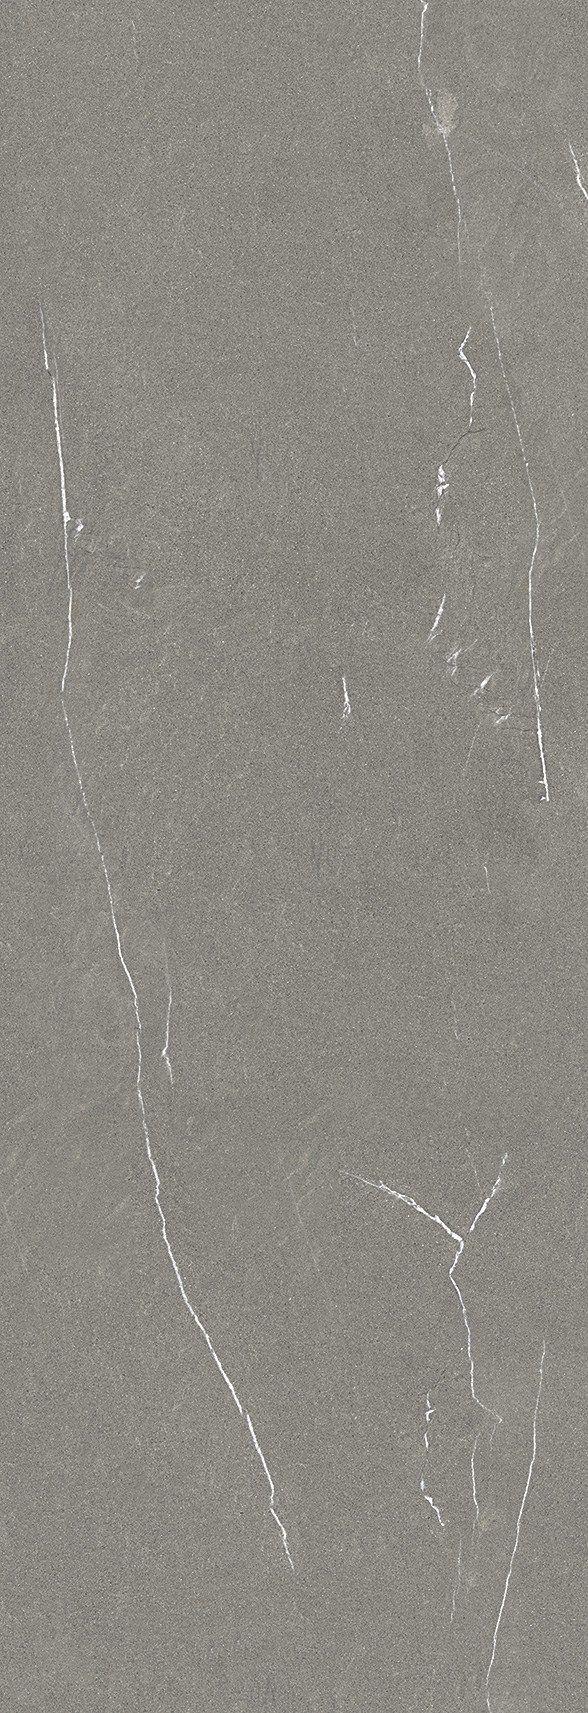 rev tement de sol mur extra fin en techlam effet pierre graphite stone by levantina. Black Bedroom Furniture Sets. Home Design Ideas